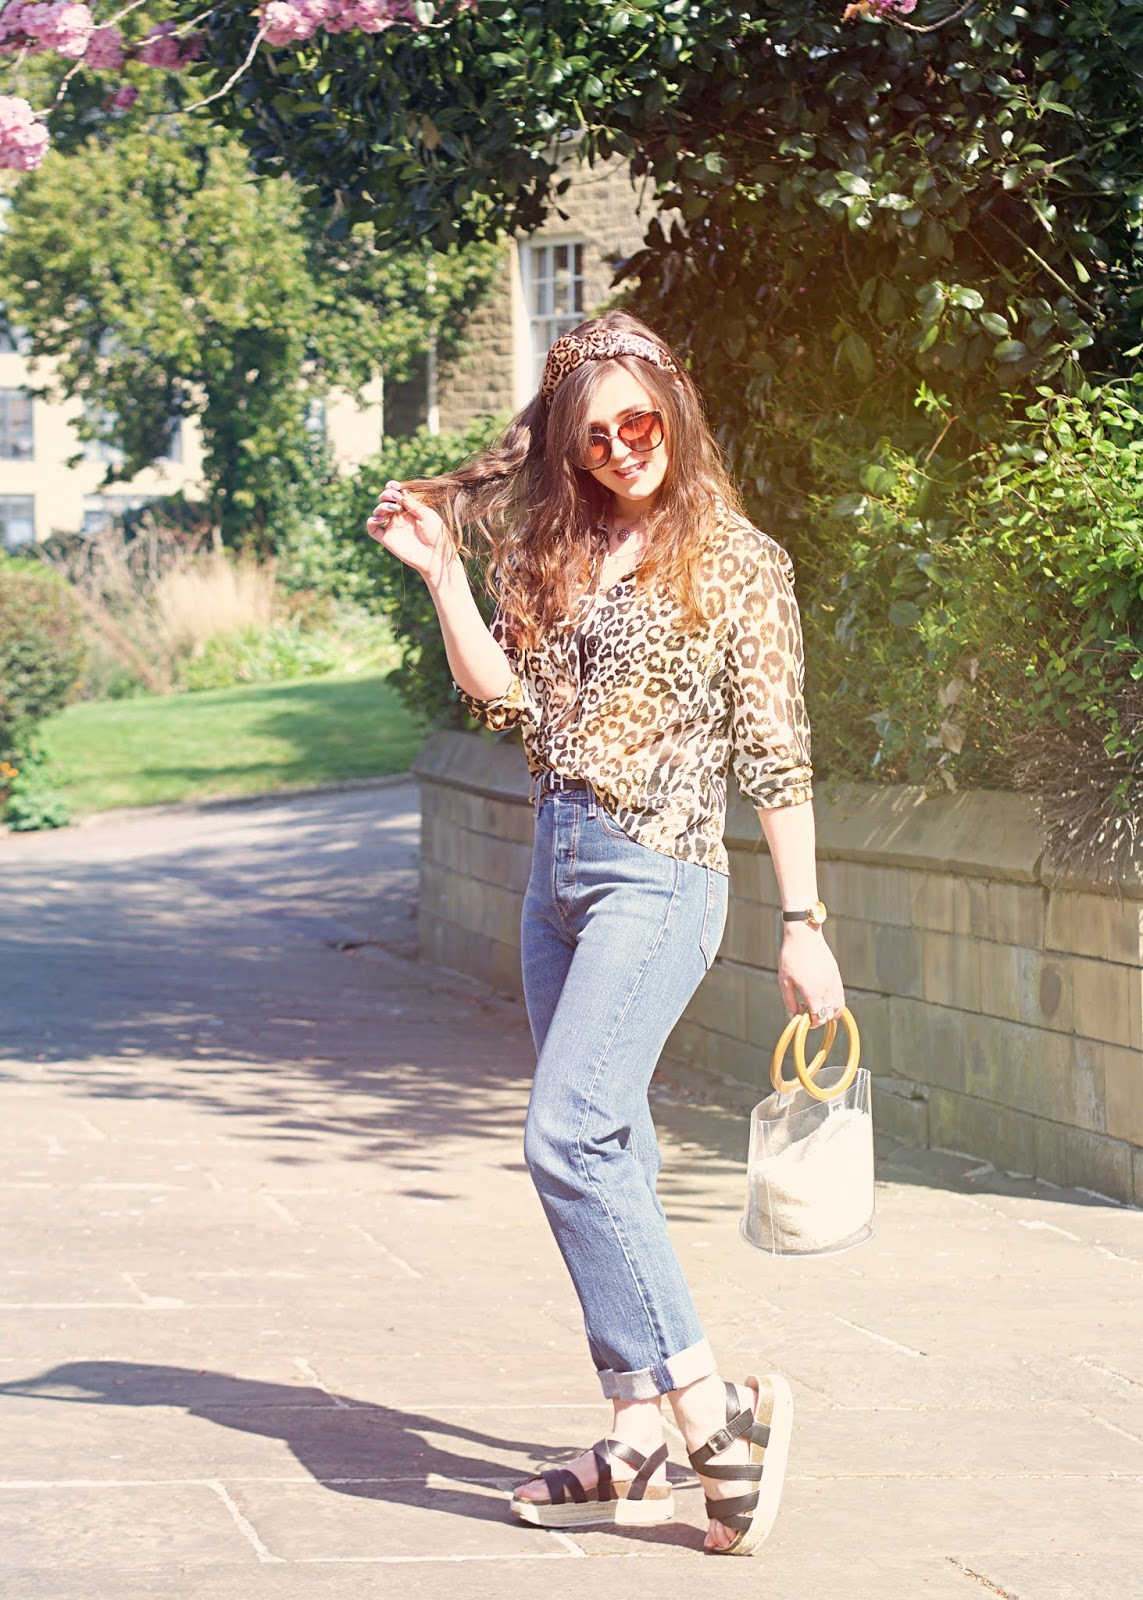 styling leopard print